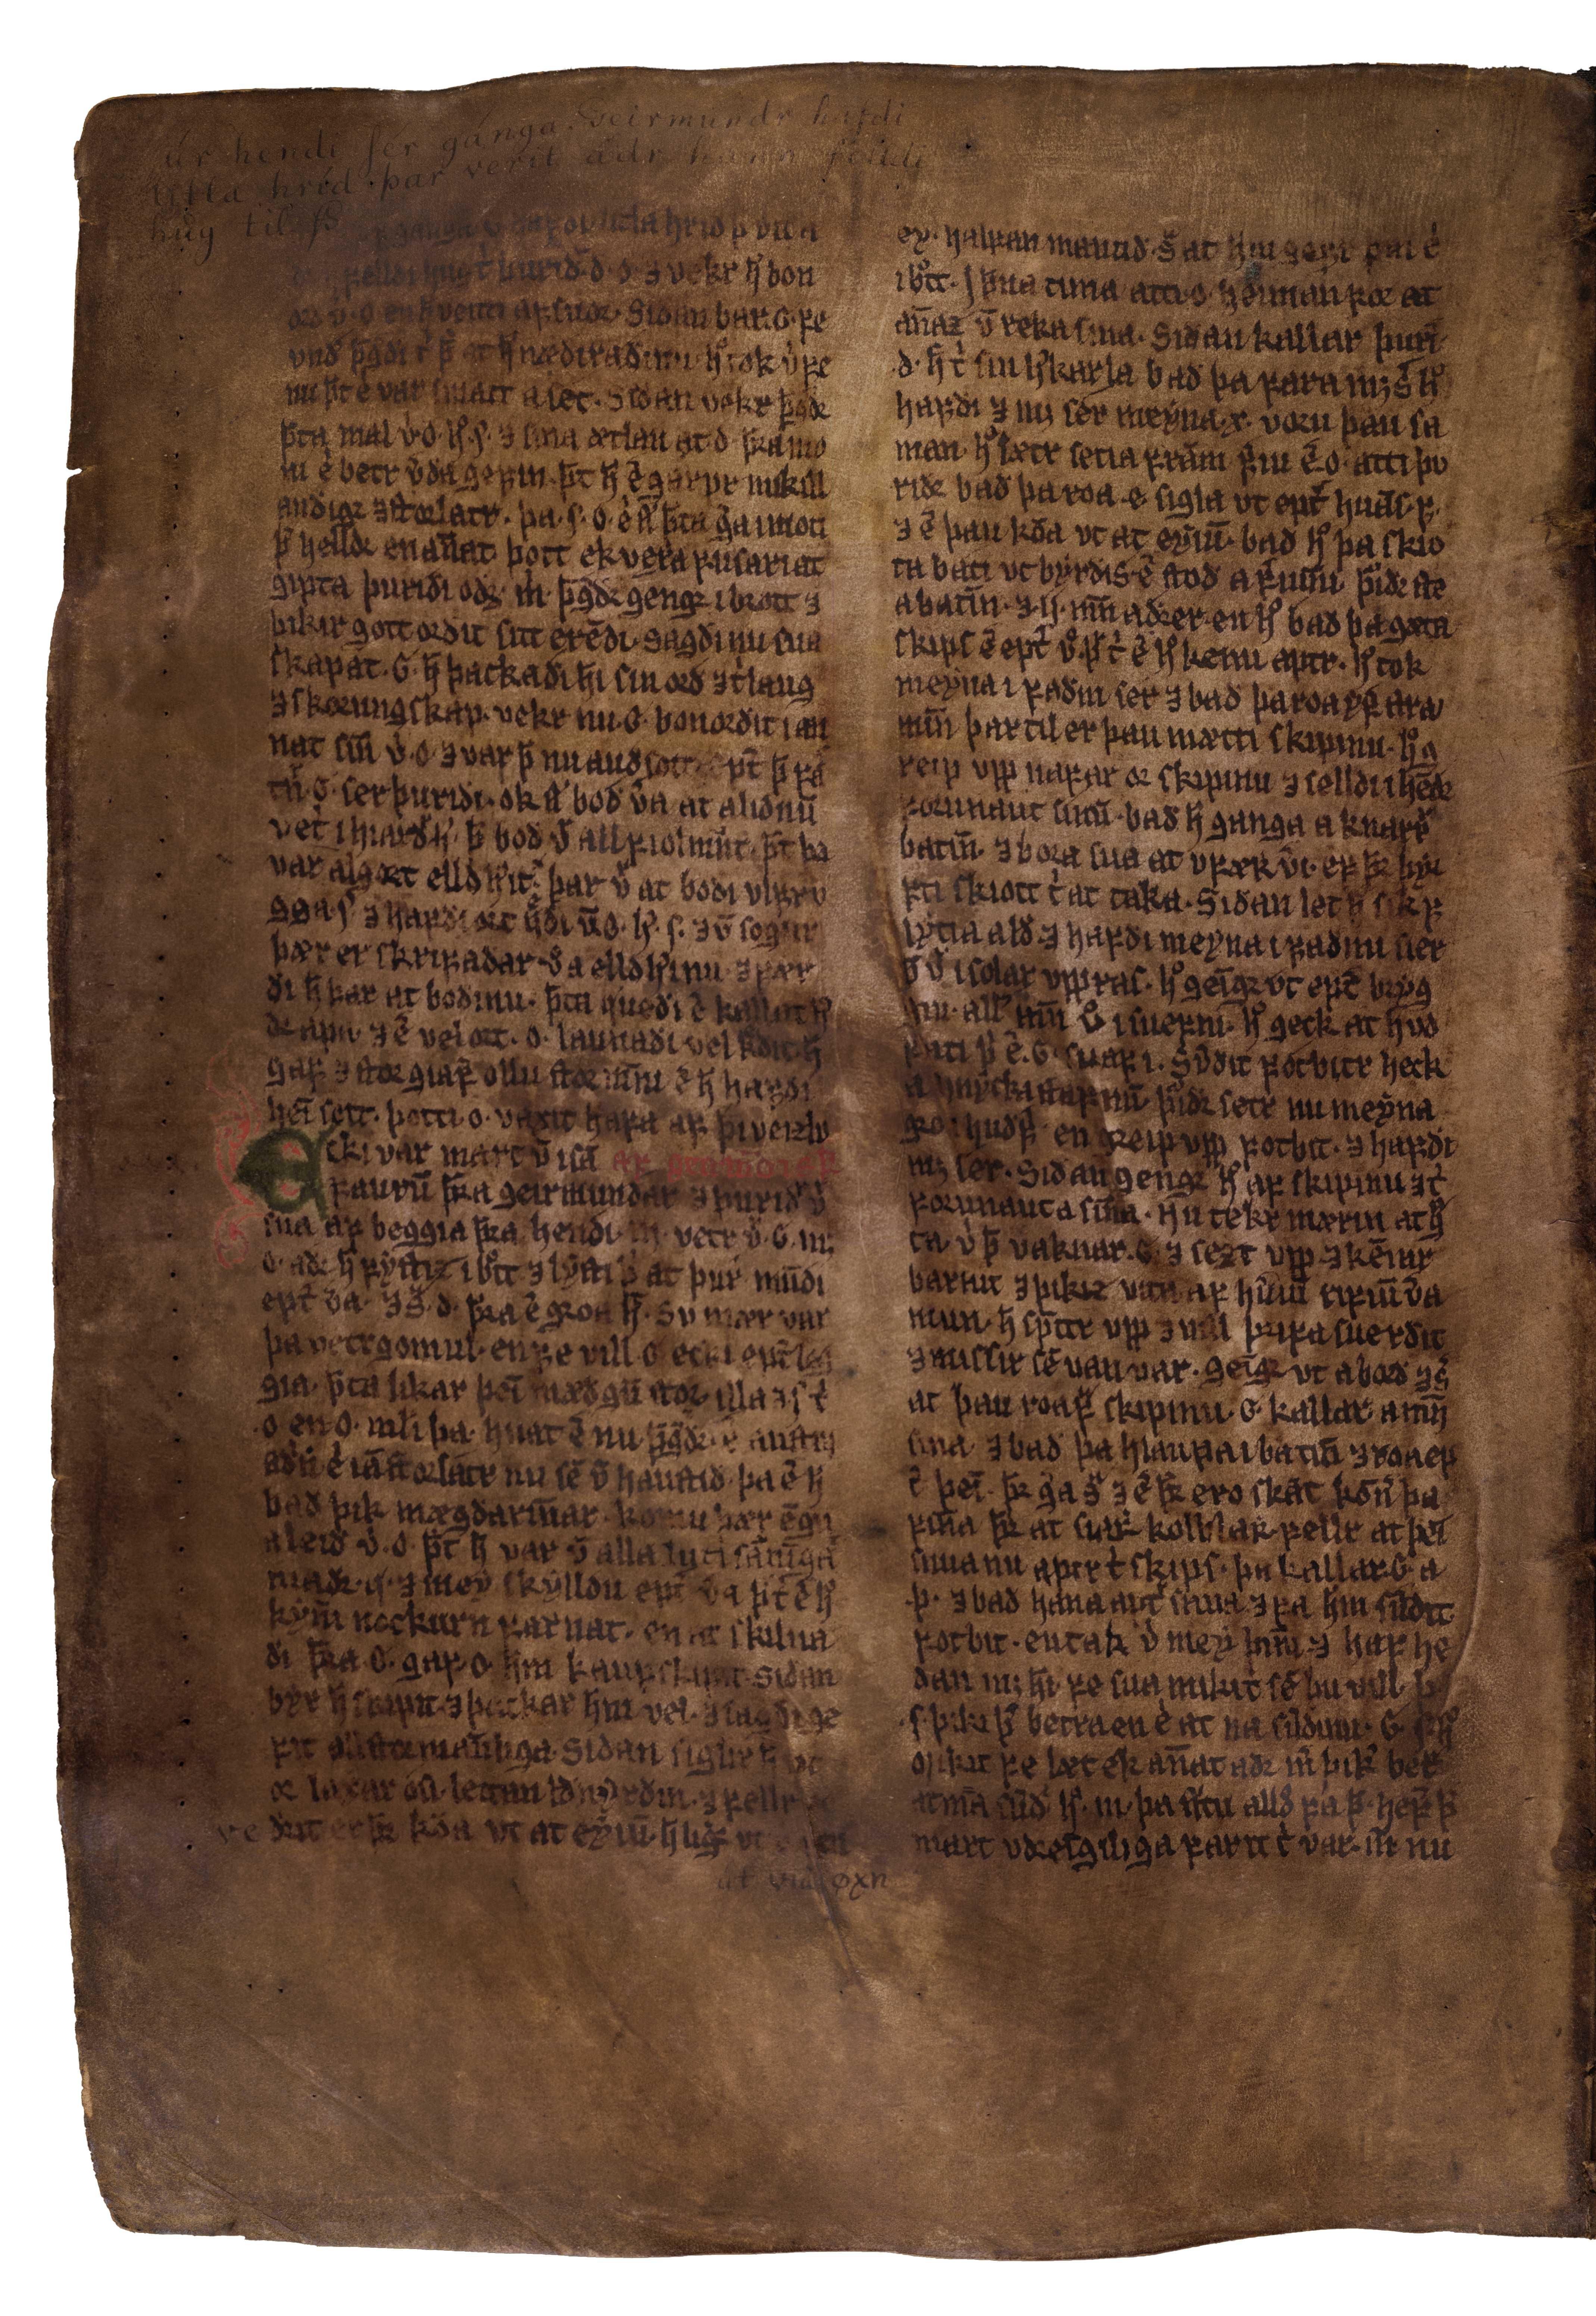 AM 132 fol - 169v